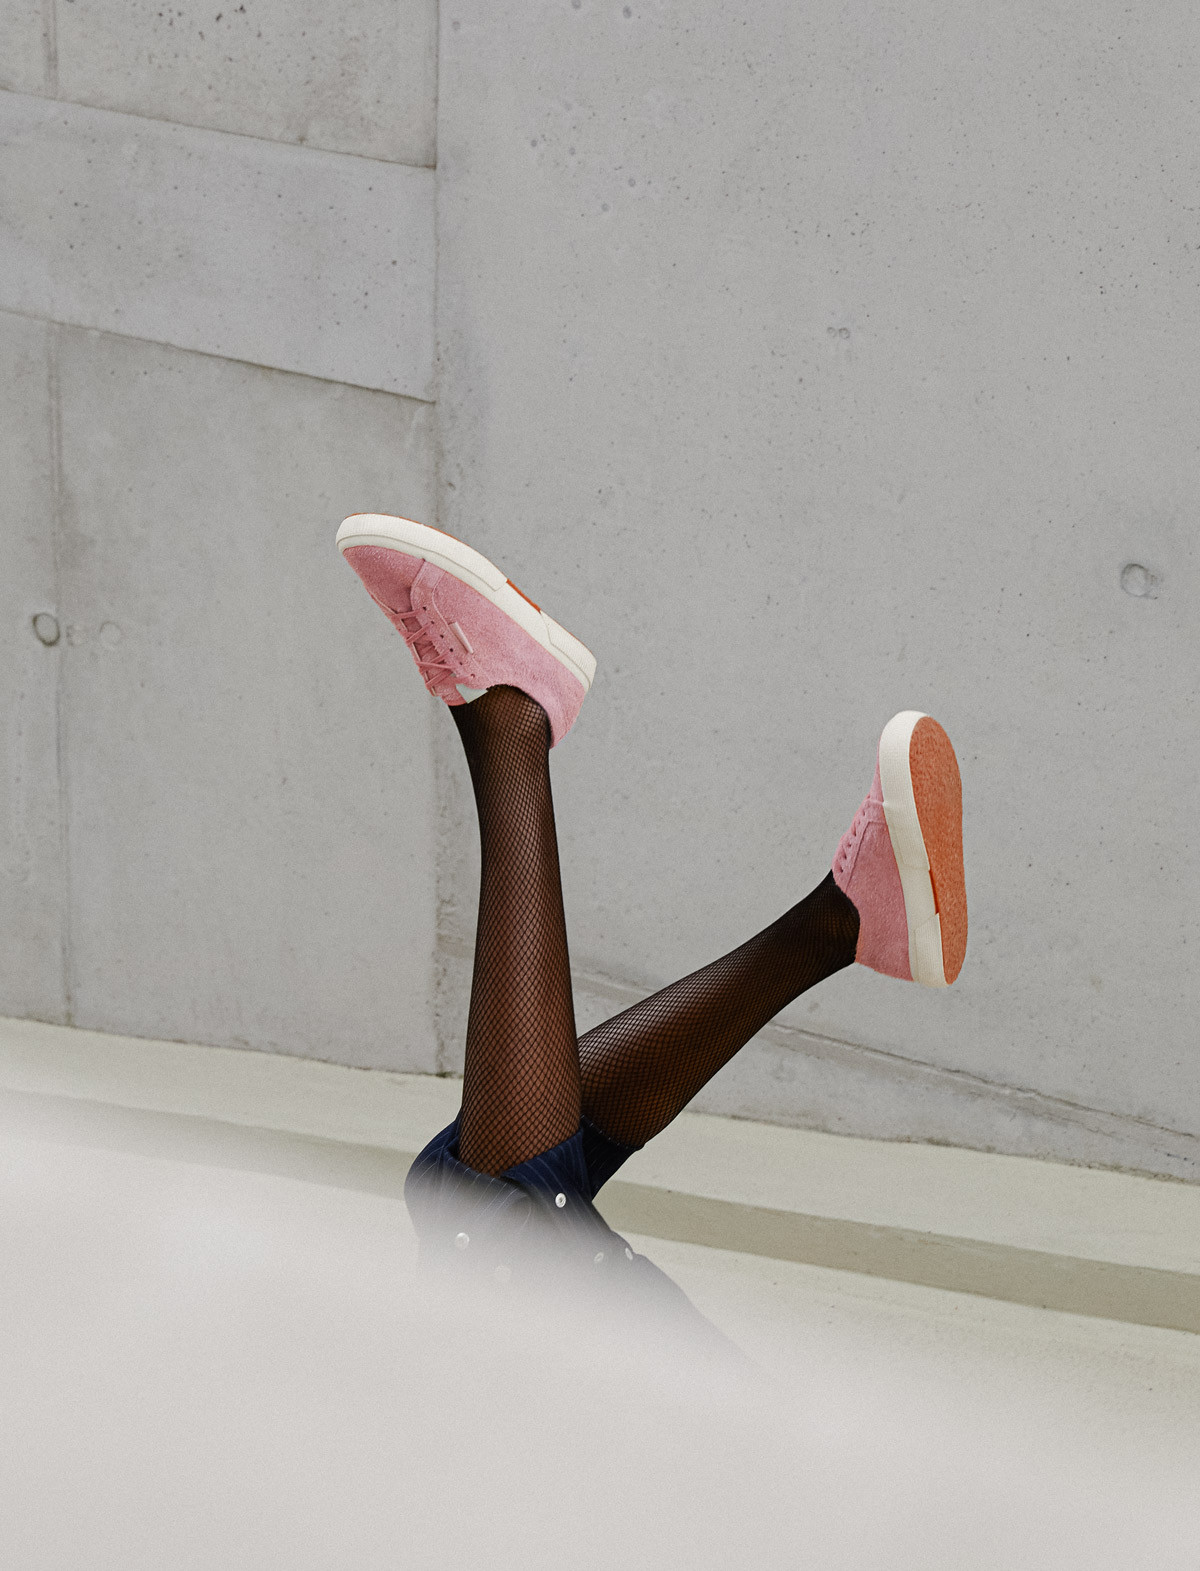 superga-x-highsnobiety-sneaker-3-1200x1571.jpg